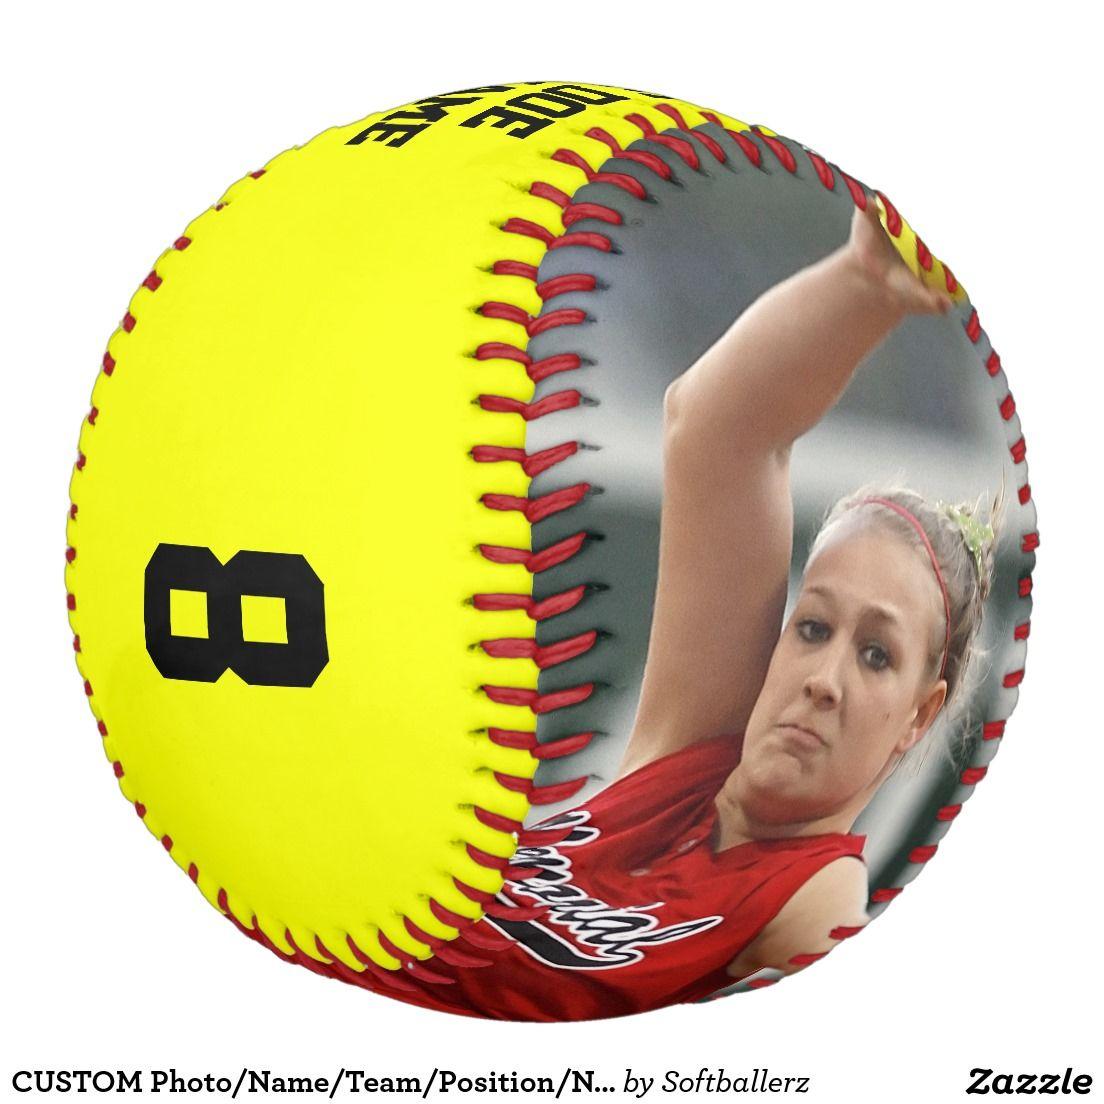 CUSTOM Photo/Name/Team/Position/Number Softball Zazzle